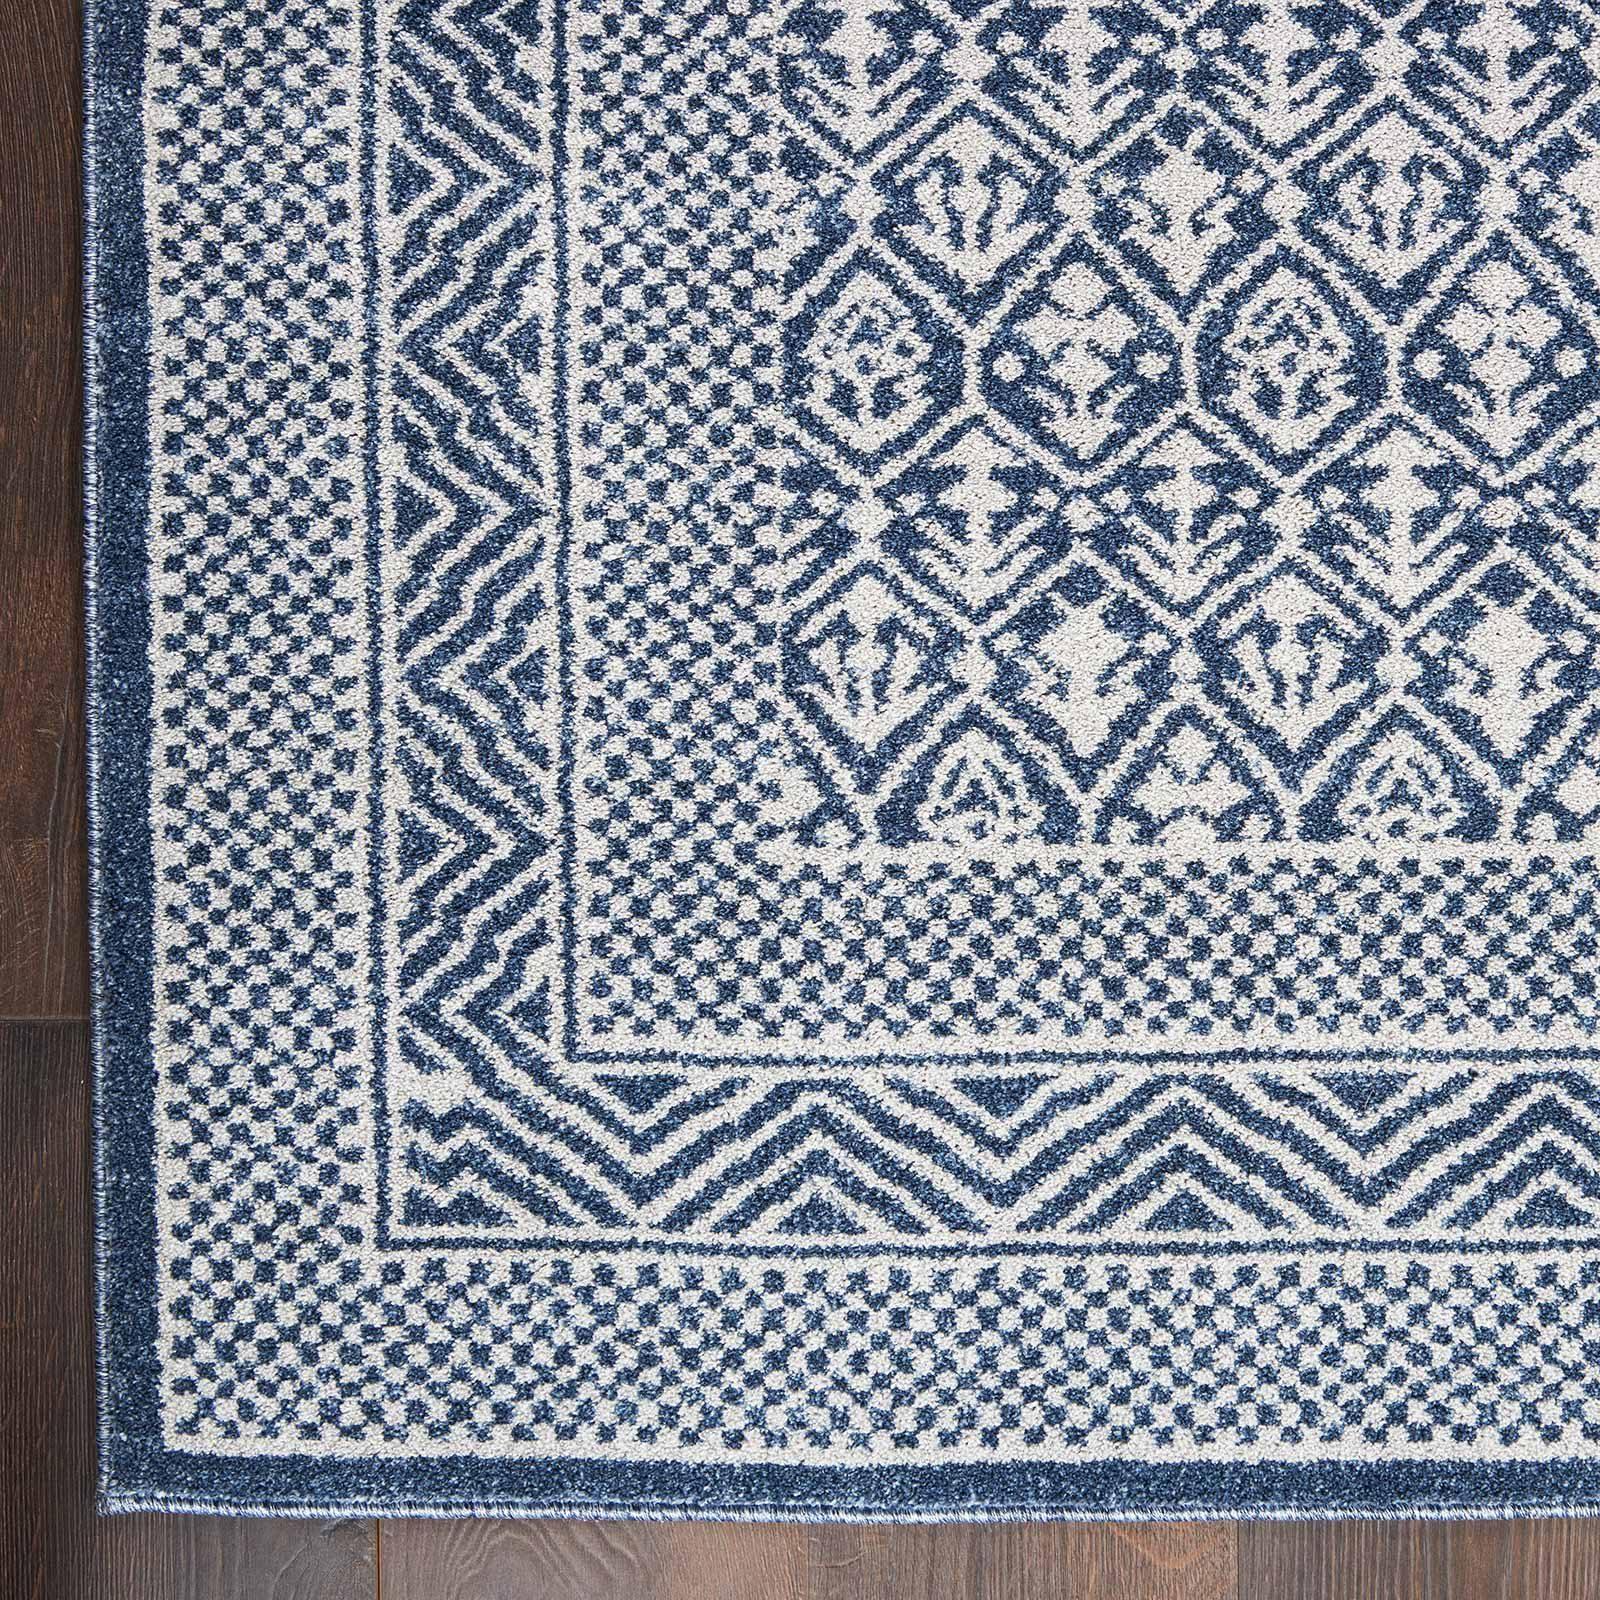 Nourison rug Palermo PMR01 BLUE GREY 5x7 099446719669 CR C